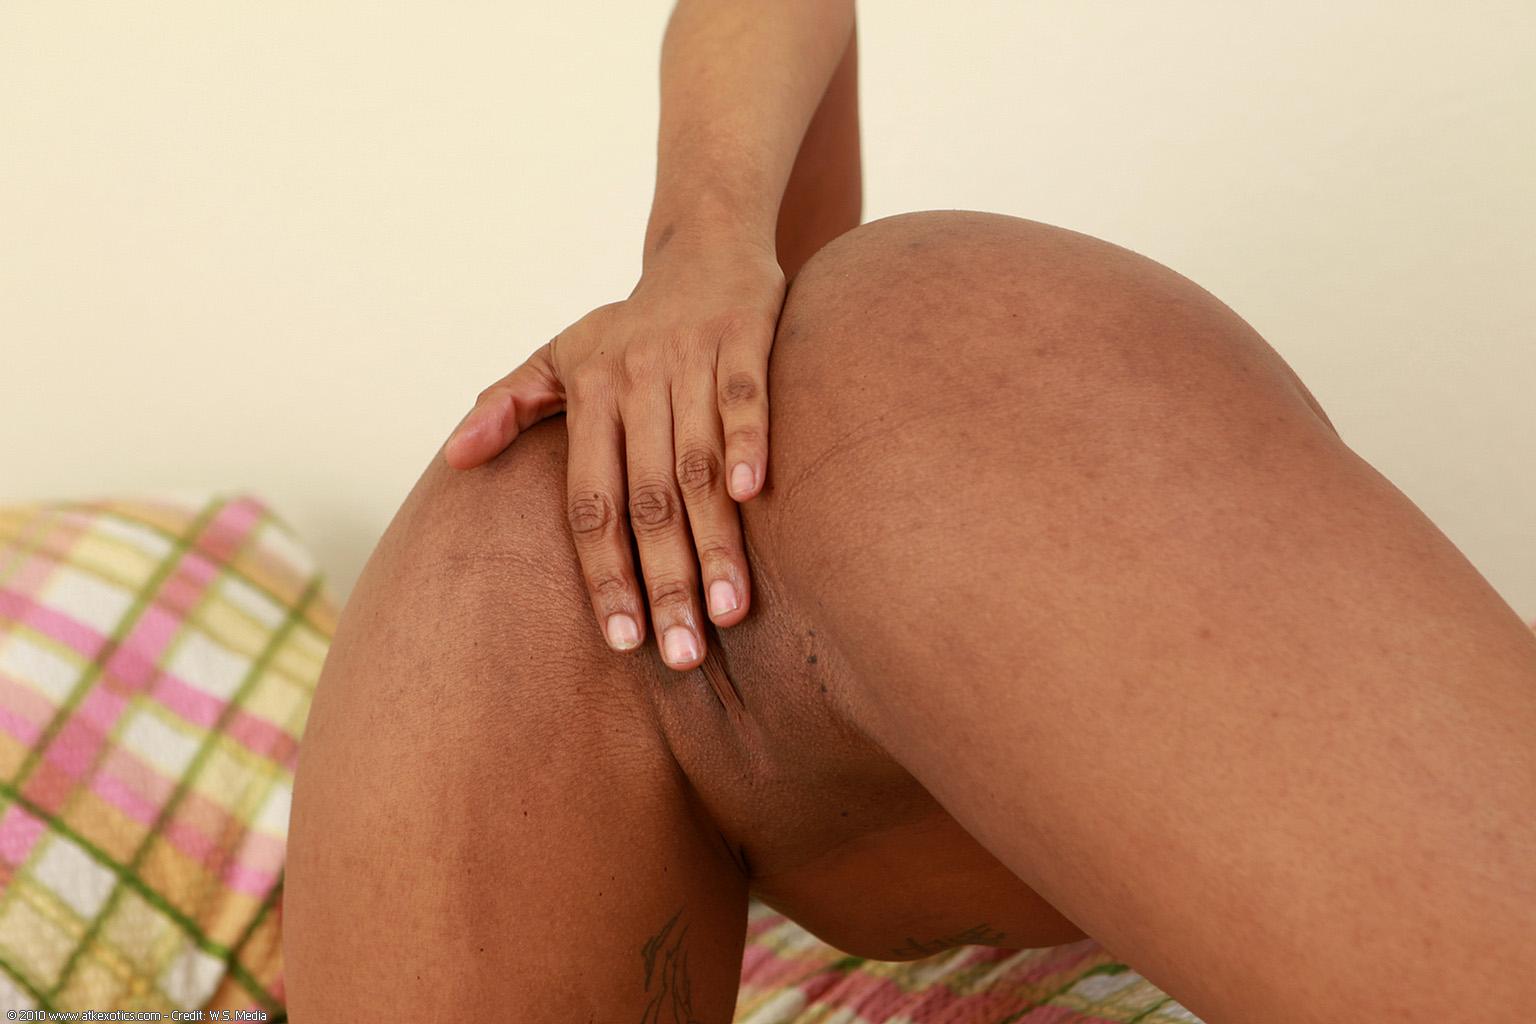 Jennie finch ass pics